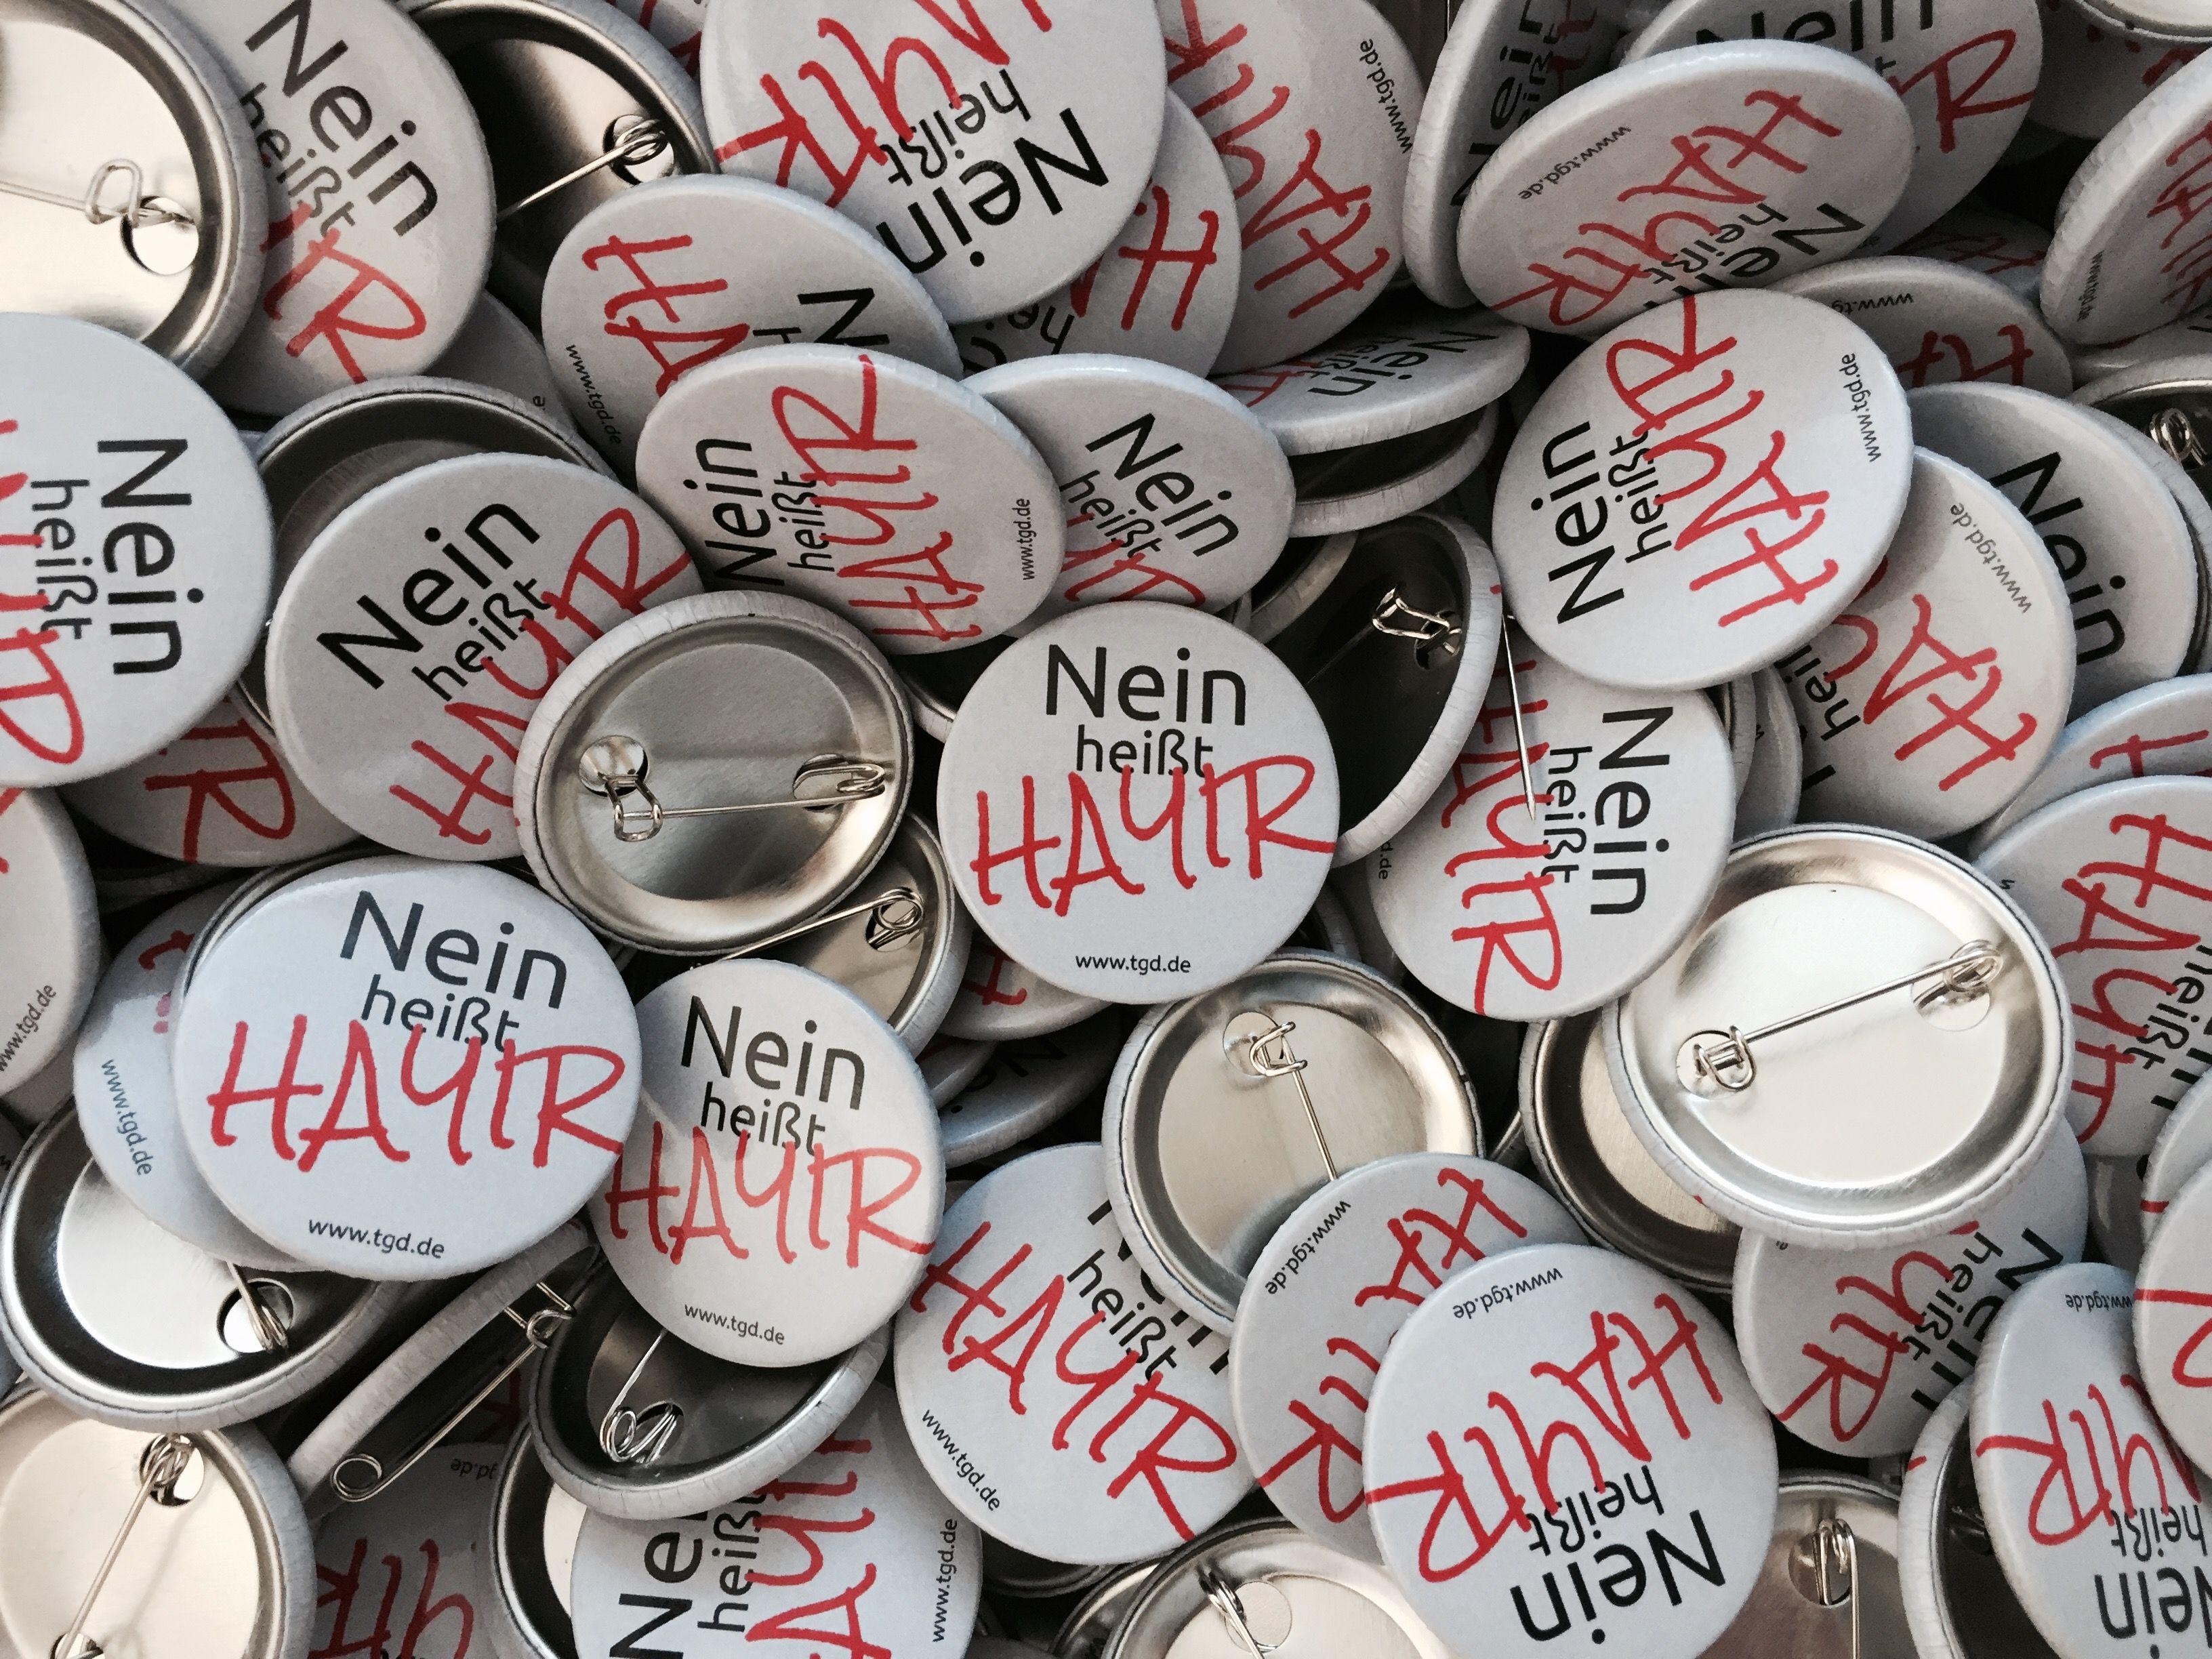 170315_Nein_heißt_HAYIR